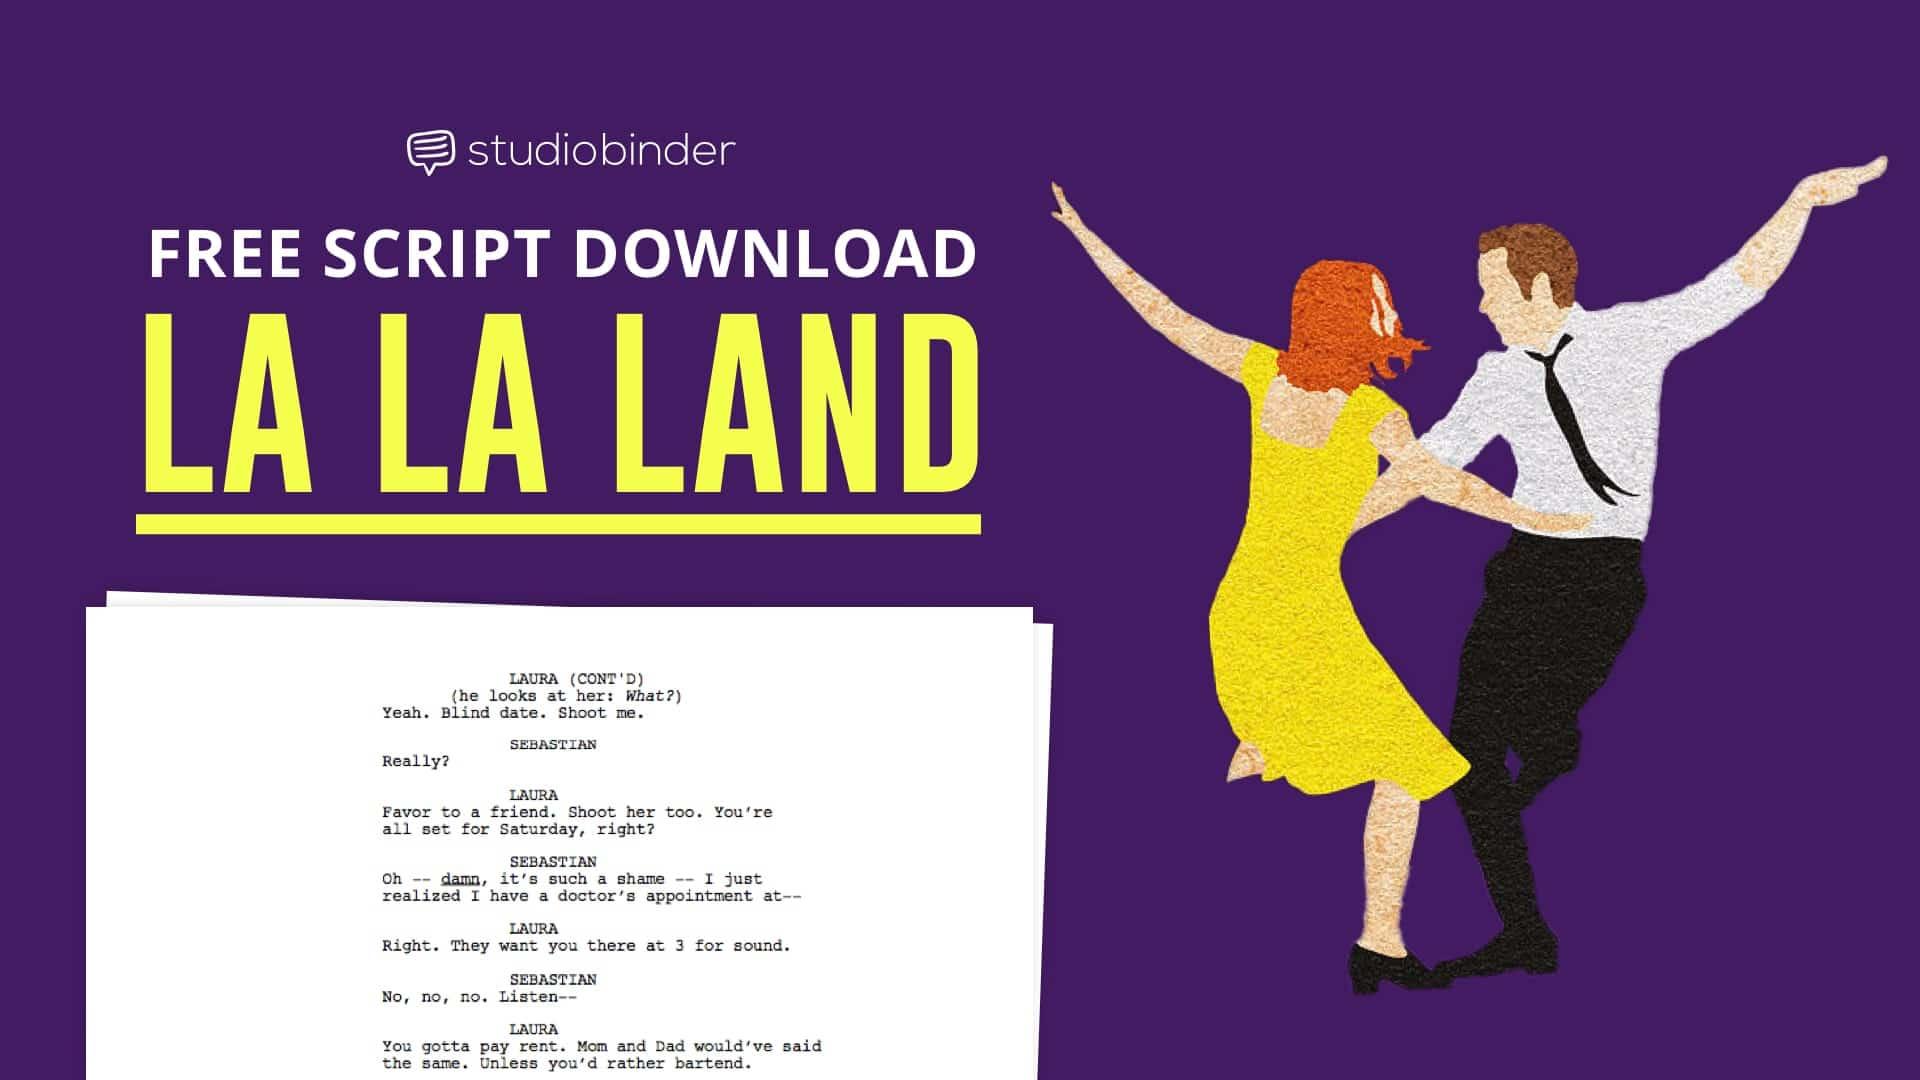 La la land script analysis free script download how to write musicals - La la land download ...